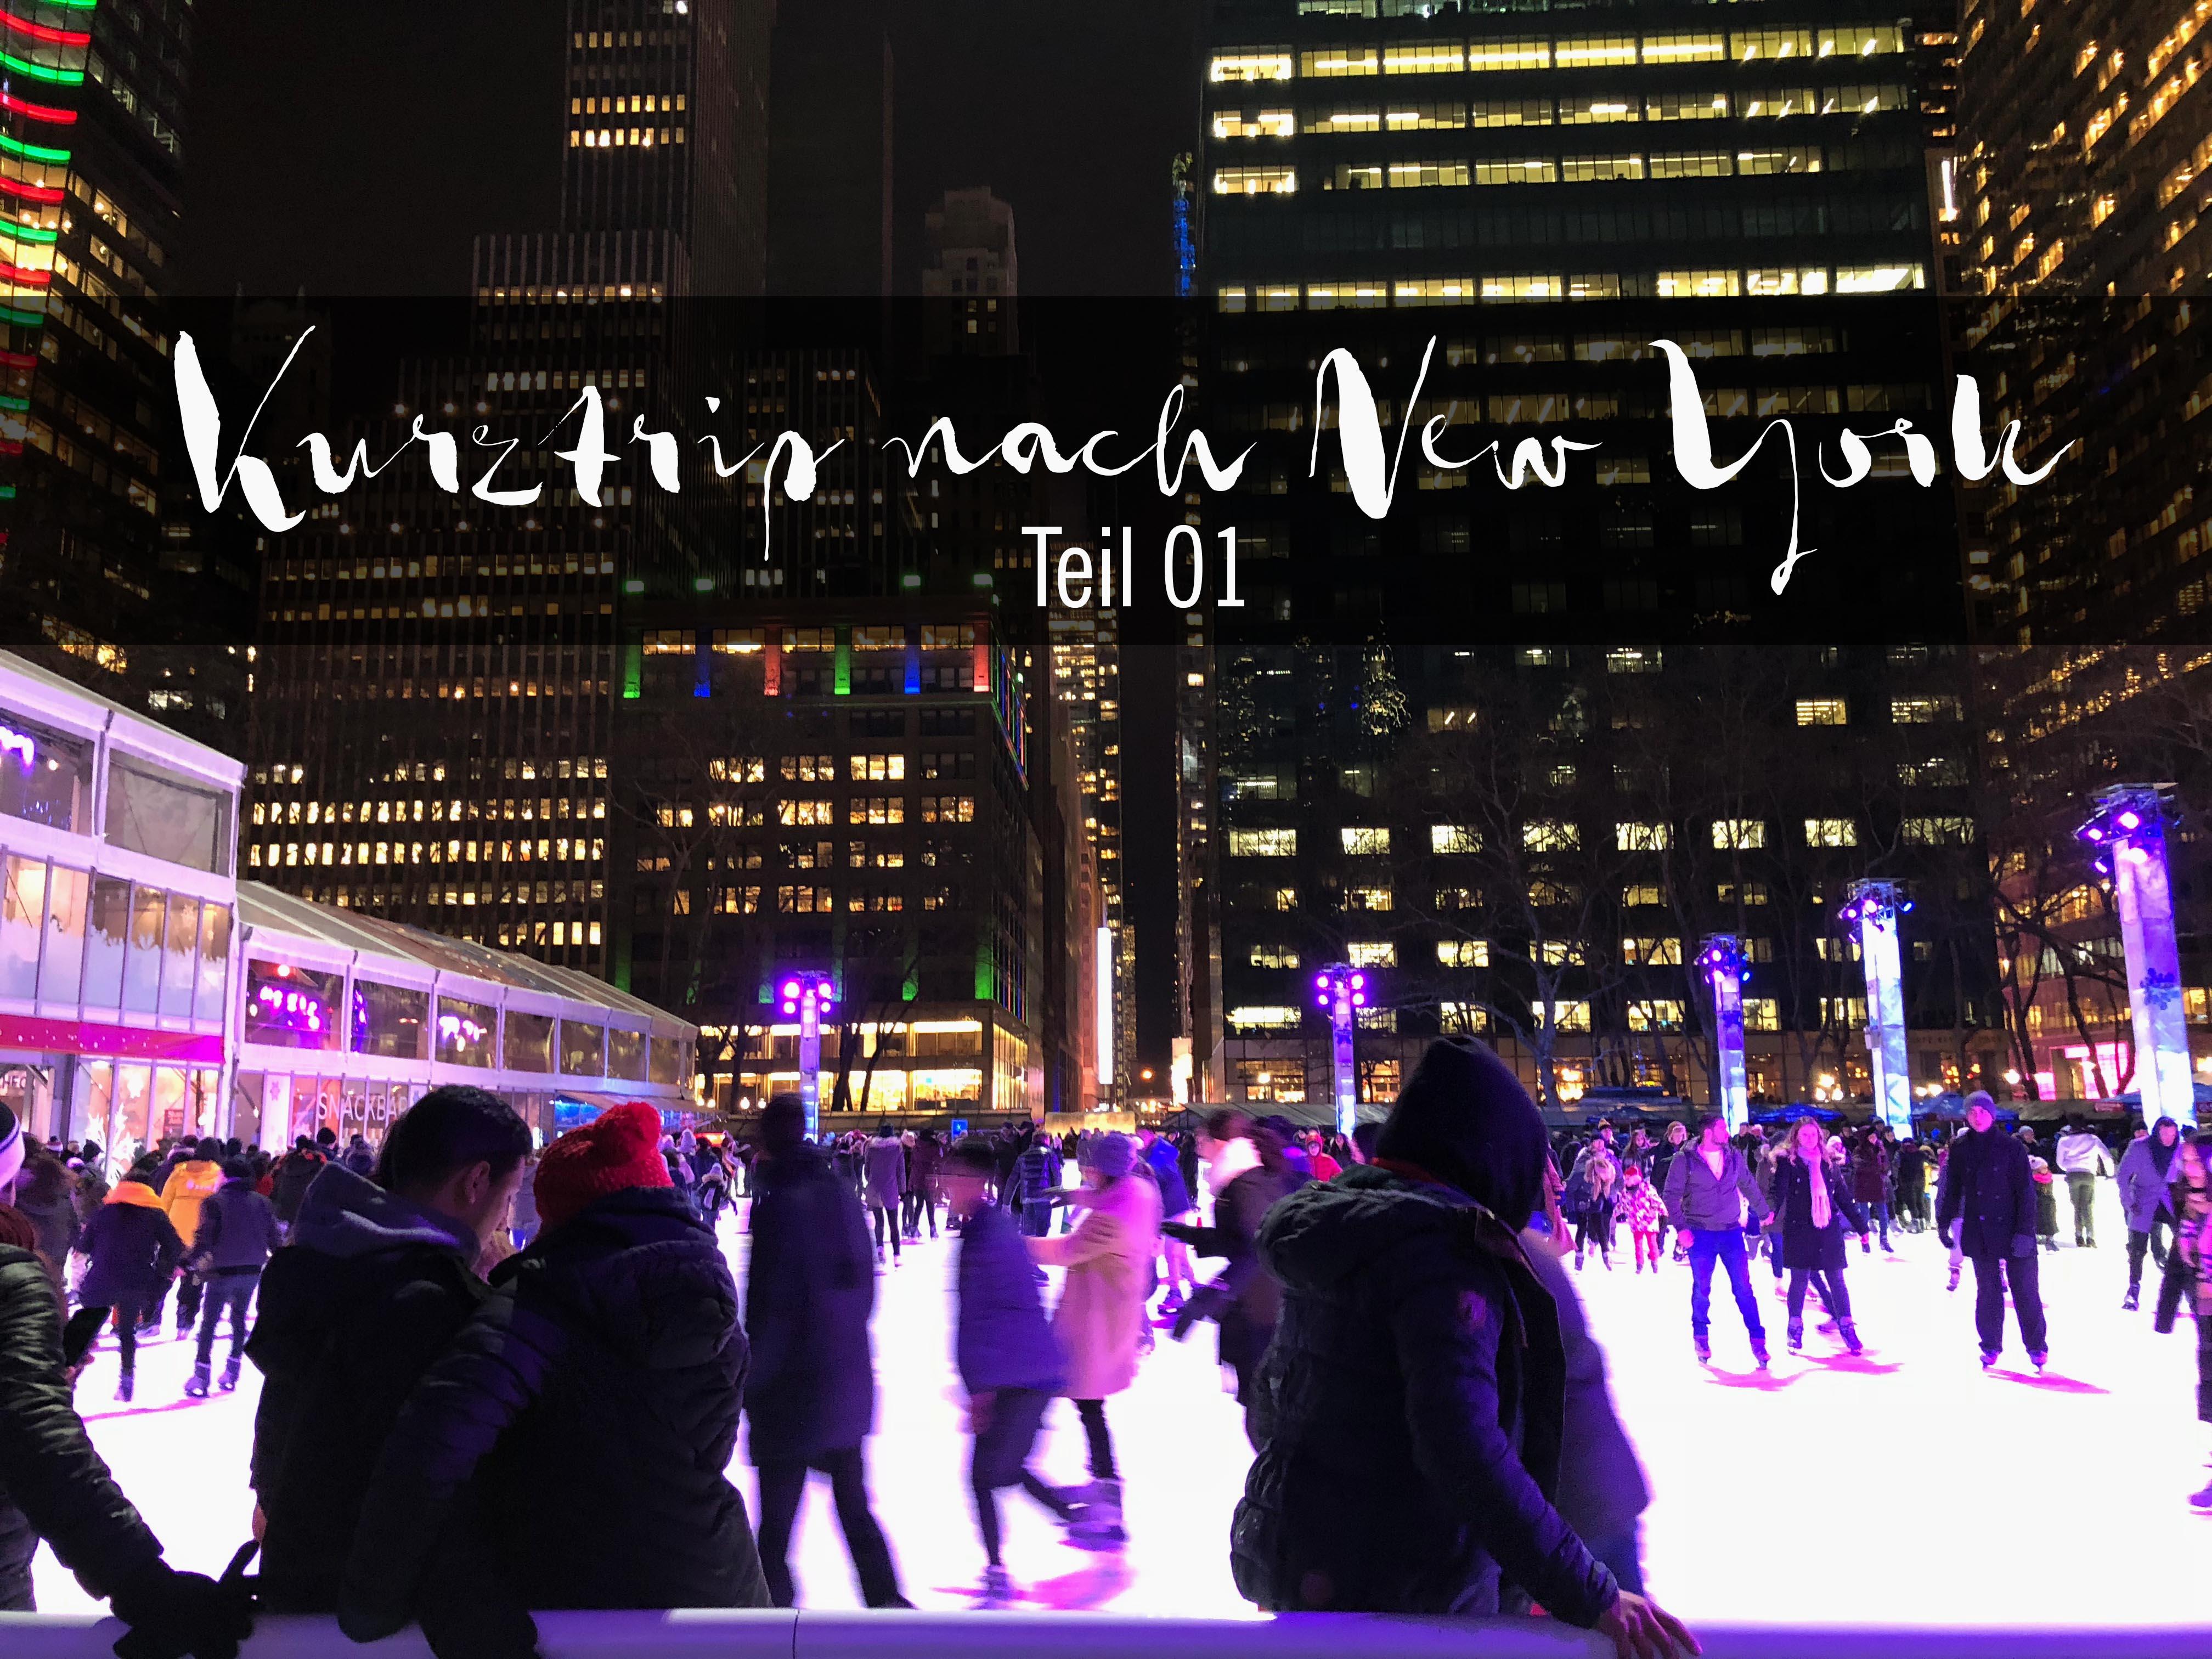 Kurztrip nach New York im Winter - Teil 01 // Traveling to New York in Winter Part 1 by http://babyrockmyday.com/kurztrip-new-york-teil-01/